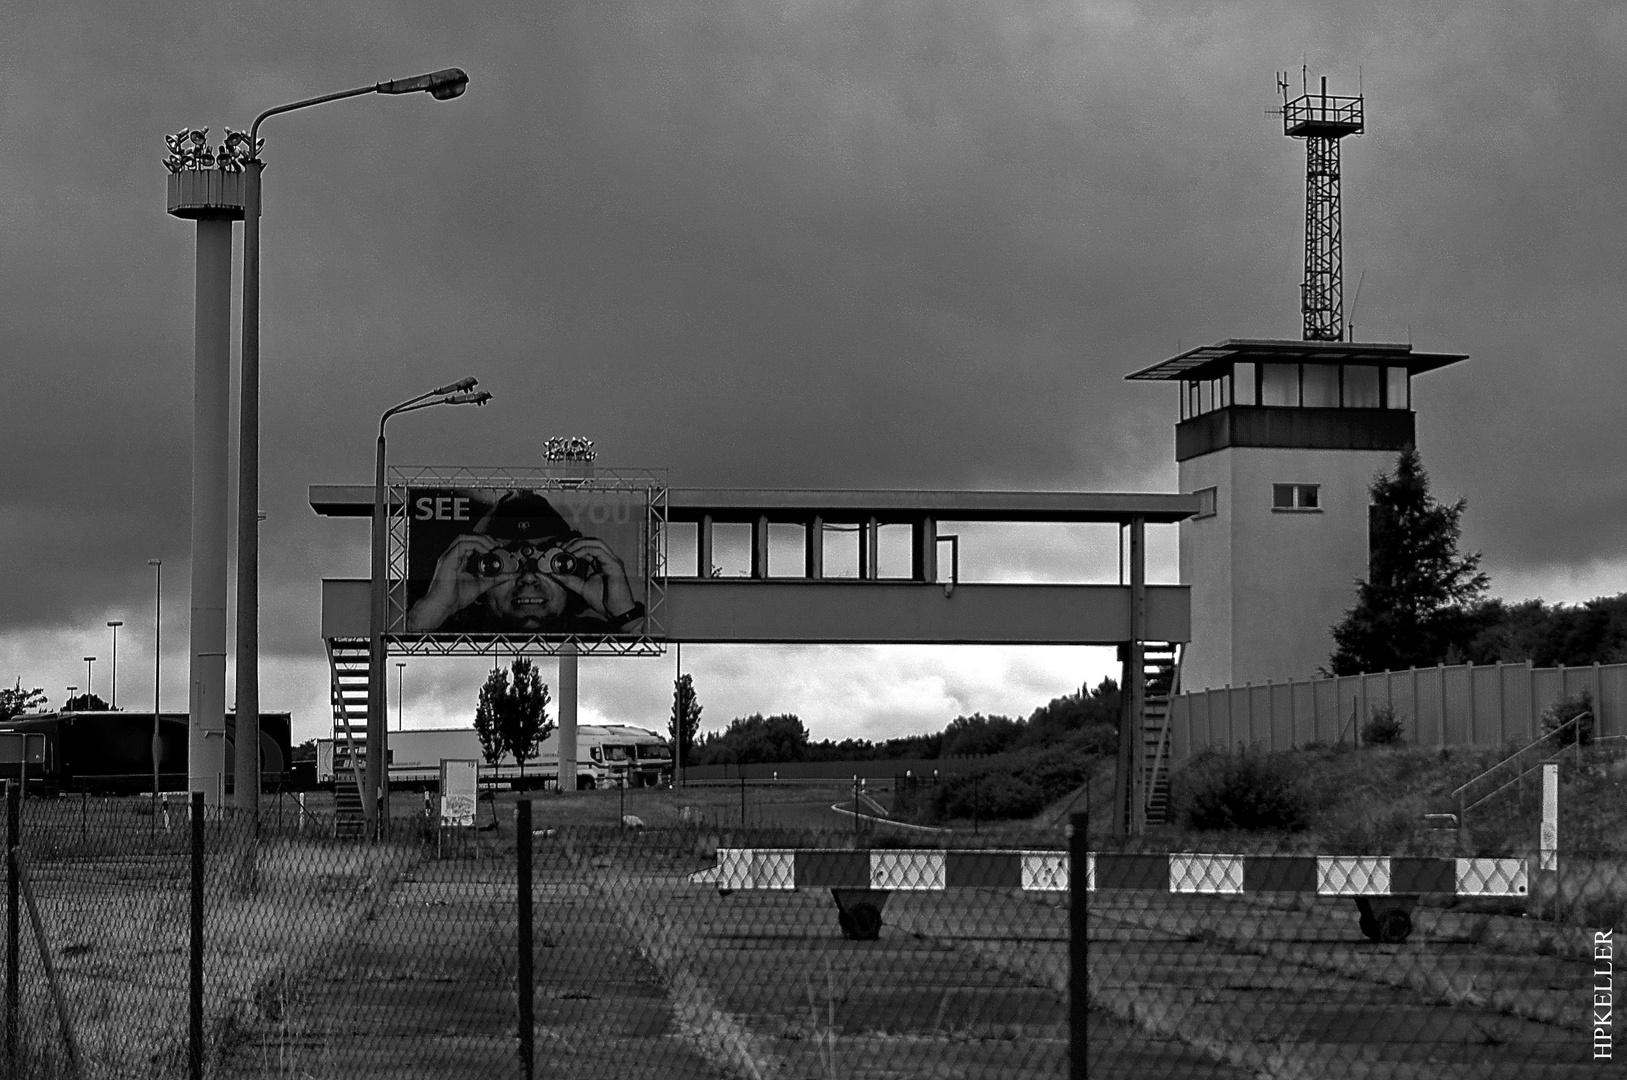 Some years ago, ...Memorial DDR Grenzübergang-Marienborn